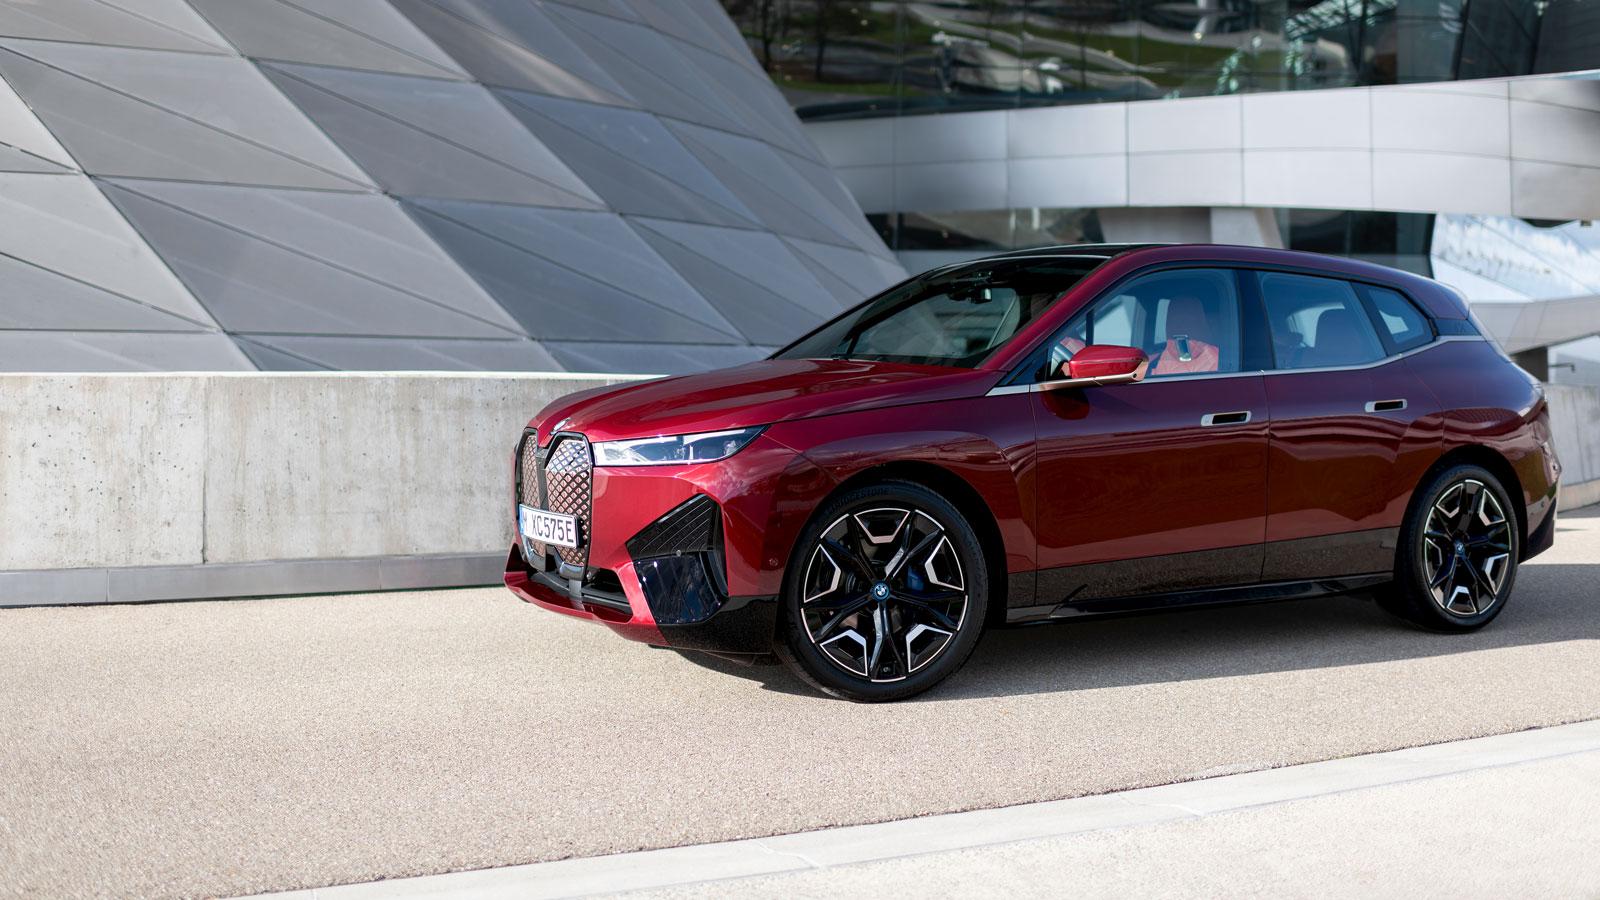 Image of a BMW iX